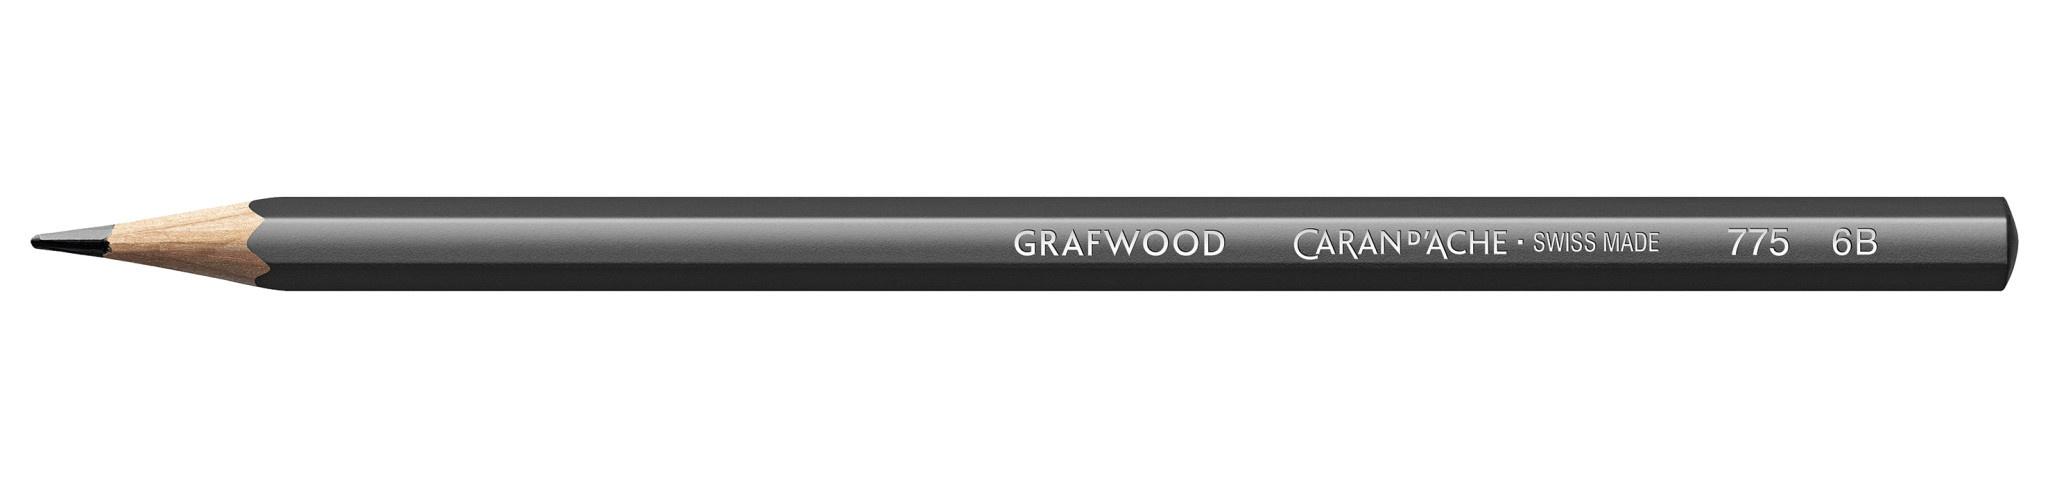 Caran d'Ache caran d'ache grafwood 6B